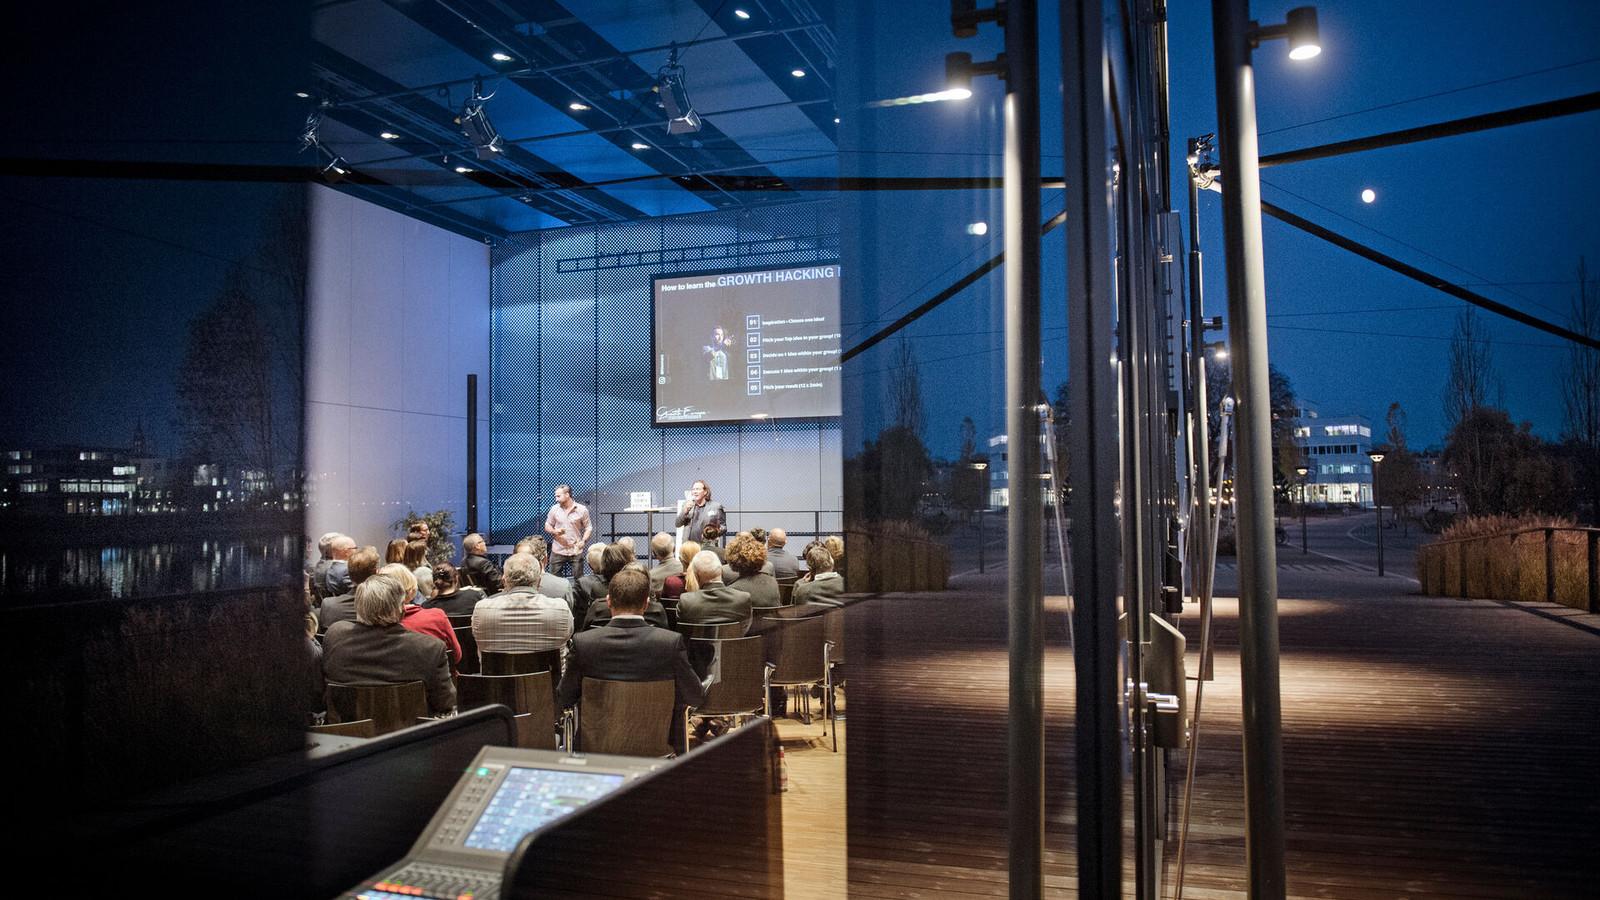 Tourismuskongress im Bodenseeforum Konstanz,  November  2018